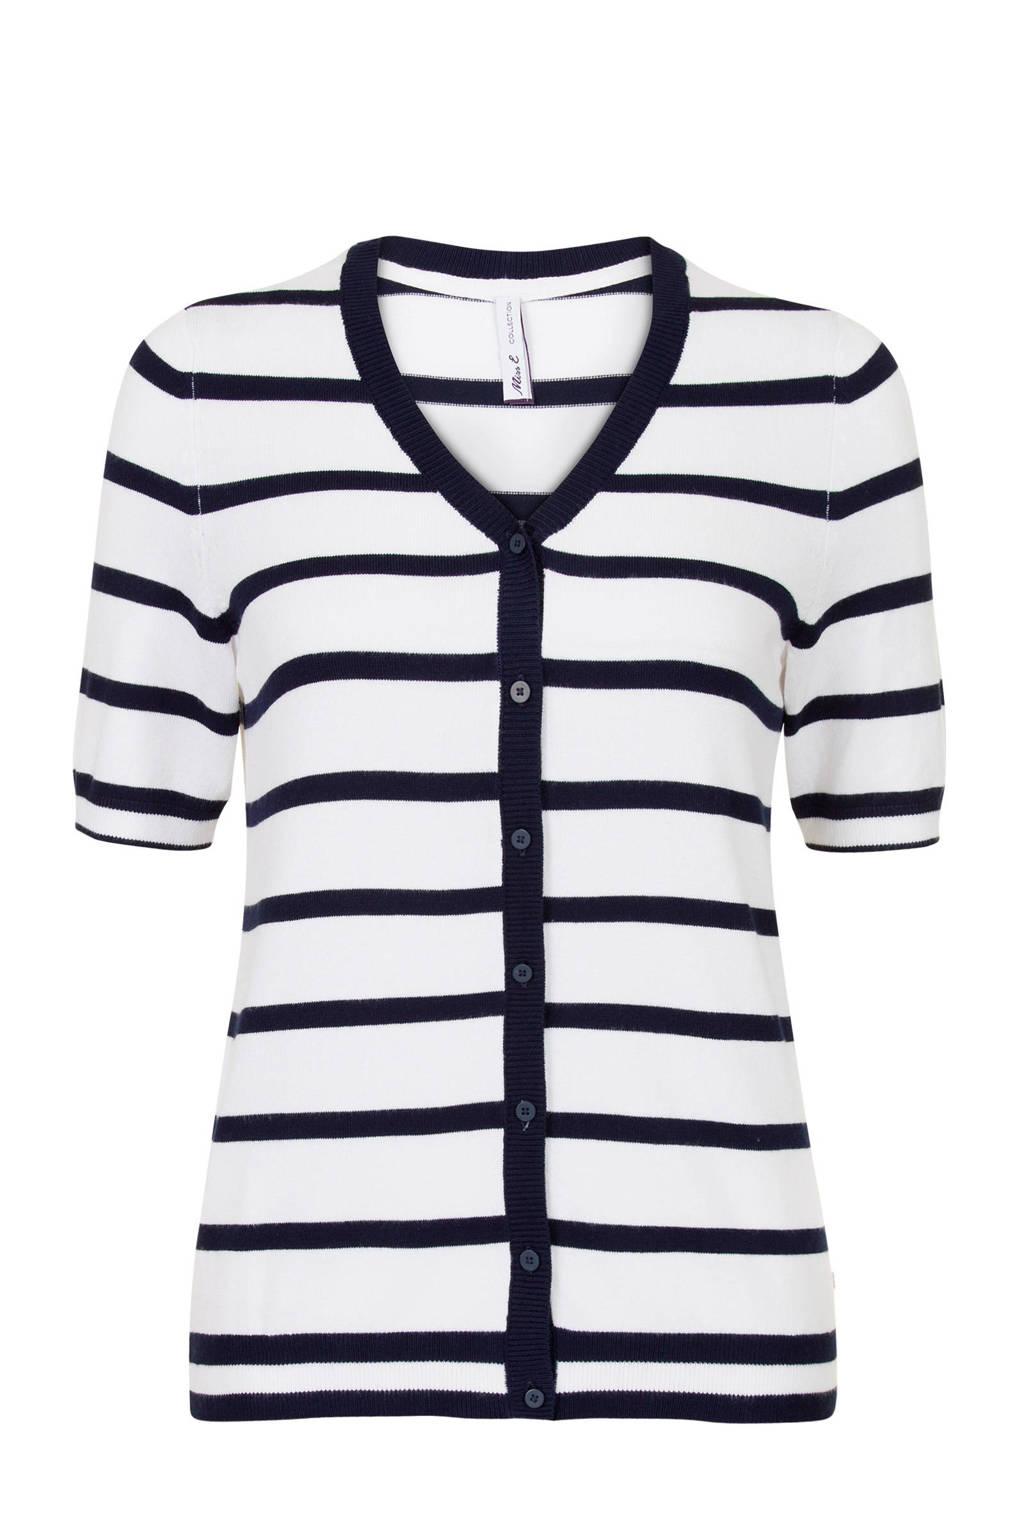 Miss Etam Regulier gestreept vest wit, Wit/blauw